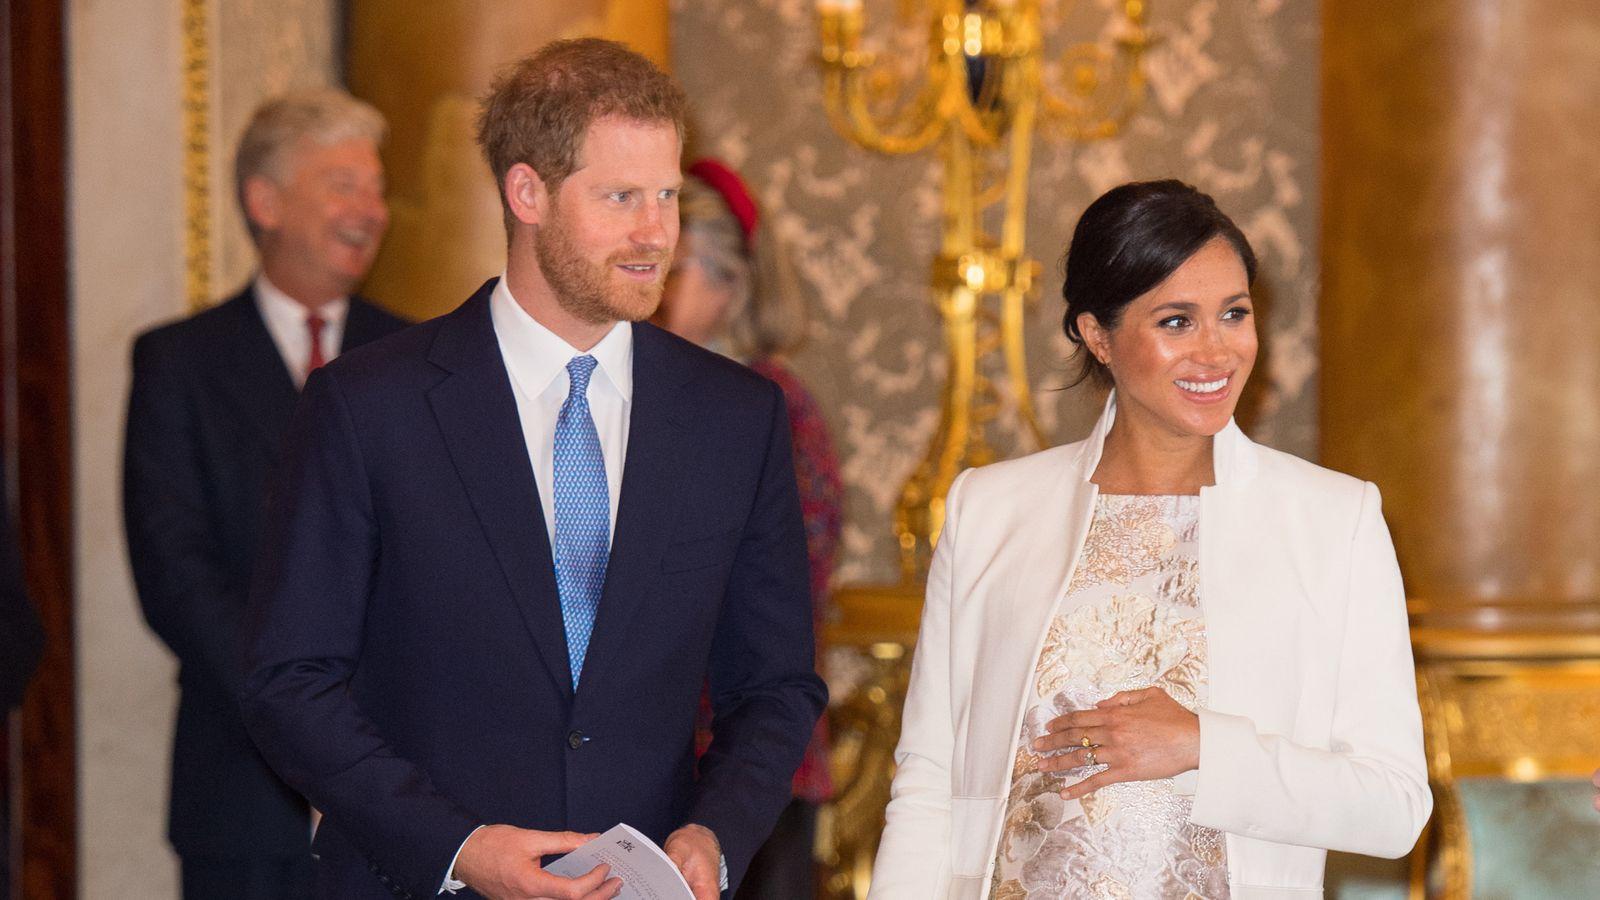 Royal baby name odds skybet betting celtic v shakhter karagandy betting sites